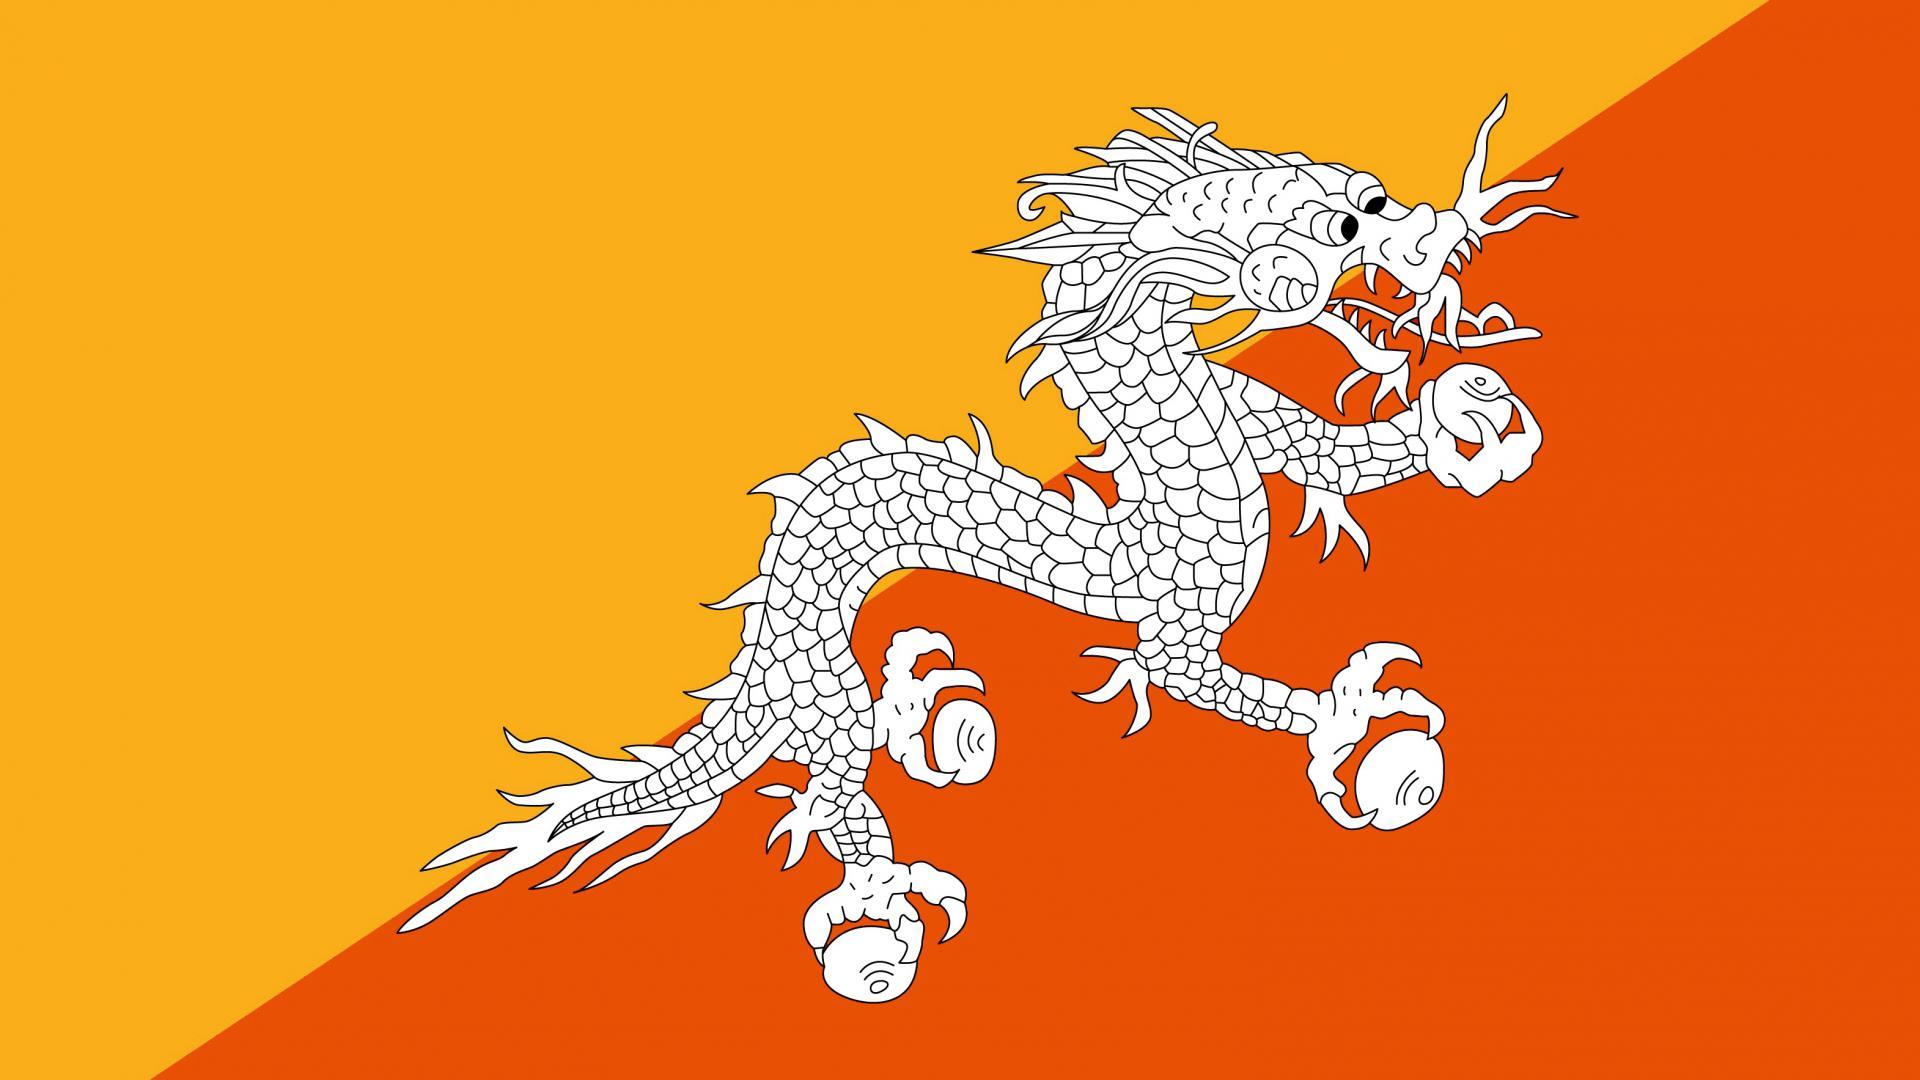 2560x1024 Hd Wallpaper Bhutan Flag Wallpaper High Definition High Quality